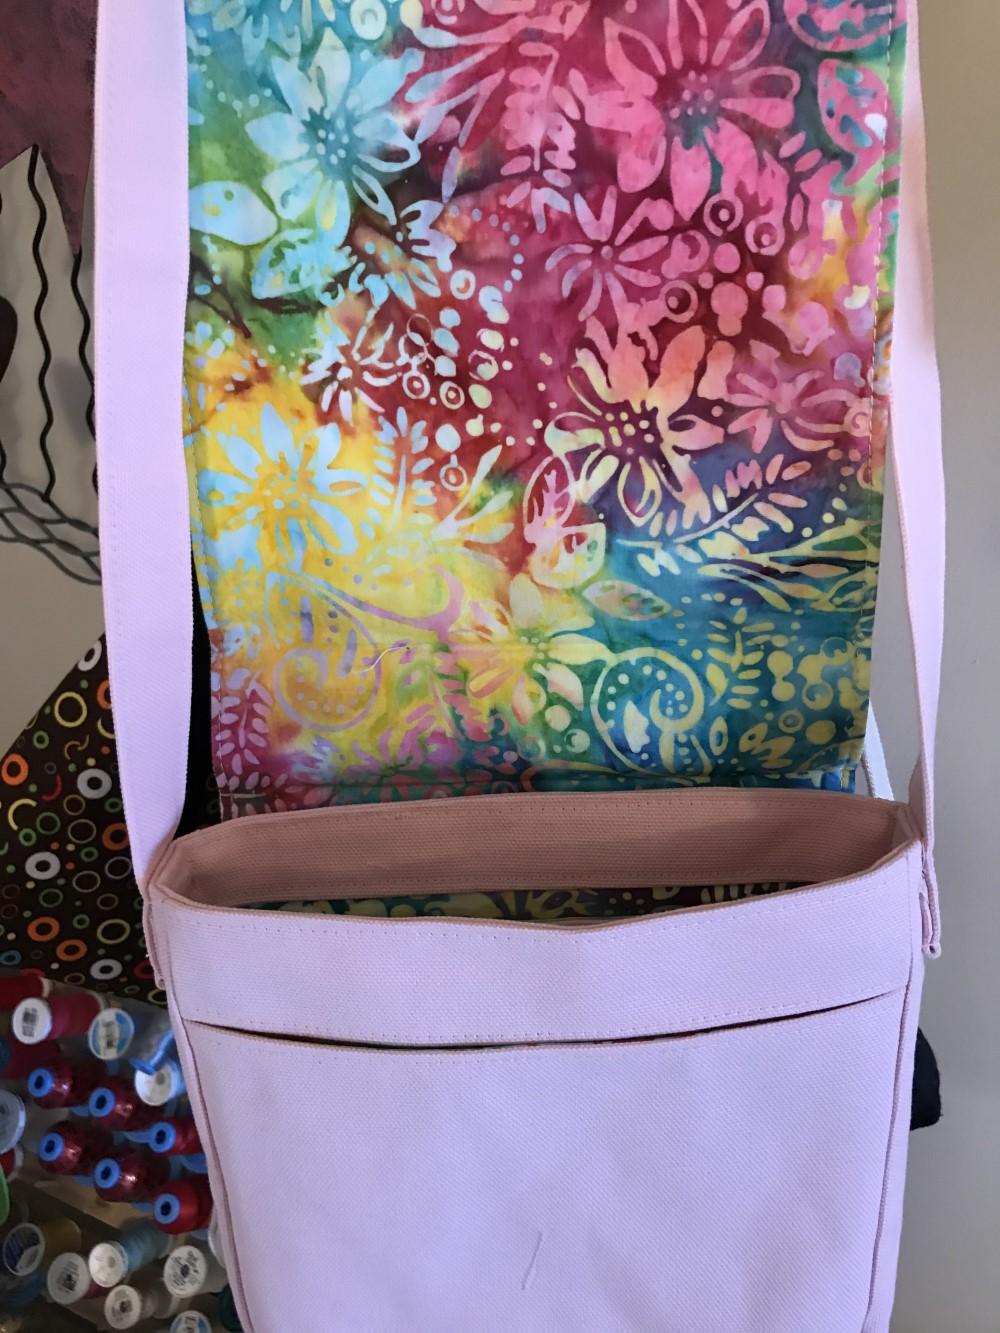 Sherri sewing tote bags for Sew Powerful